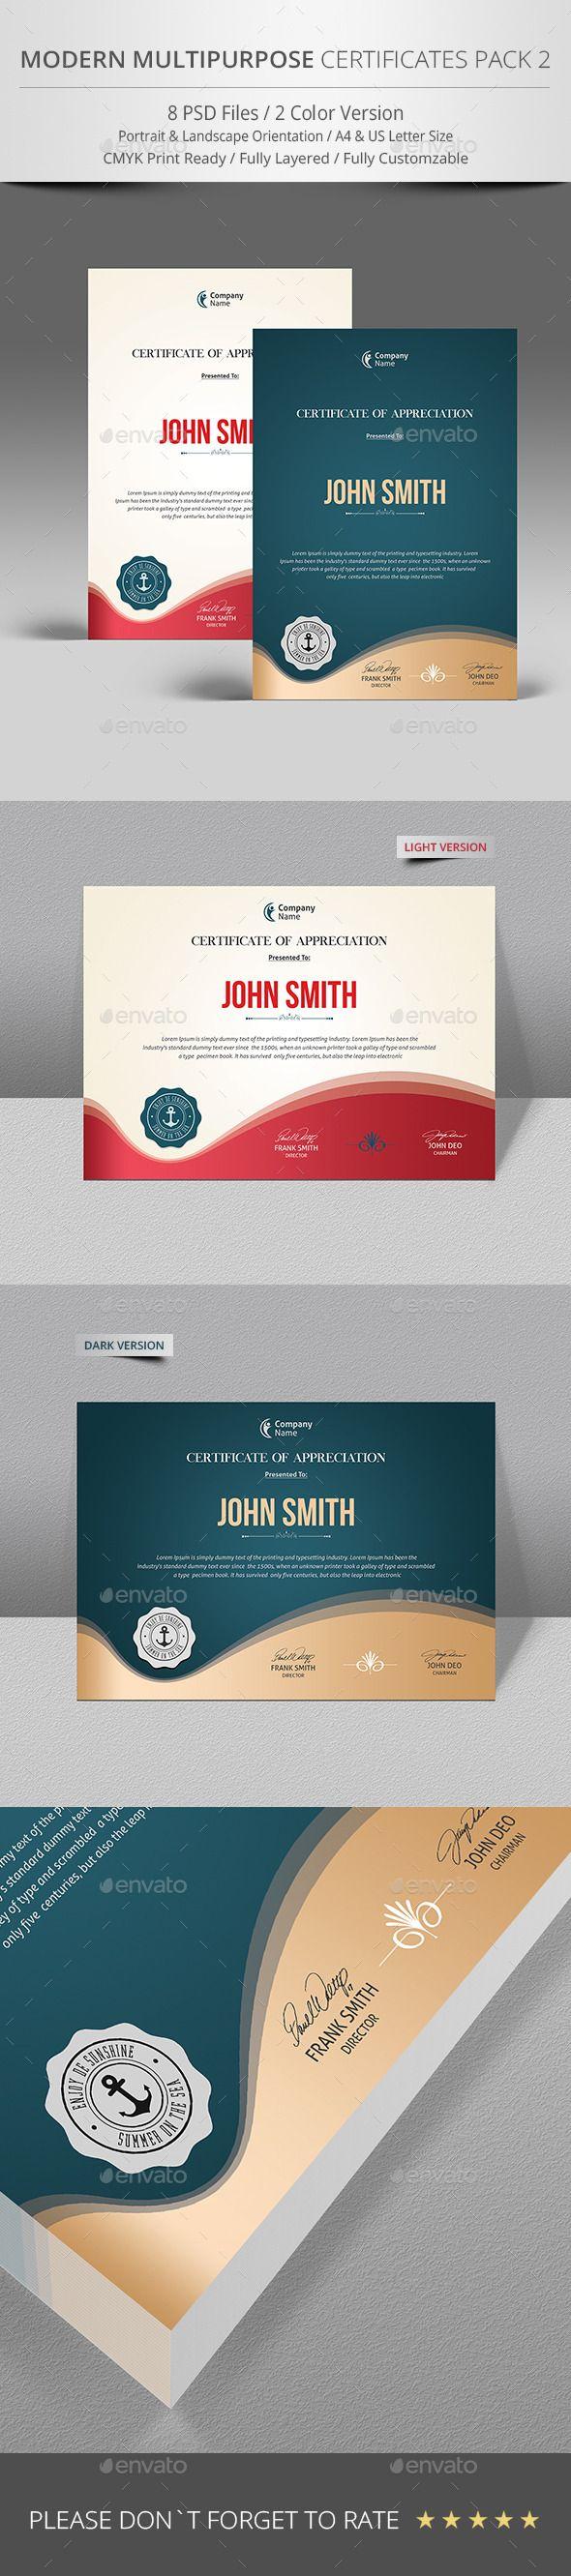 21 best Modern Certificate Design images on Pinterest